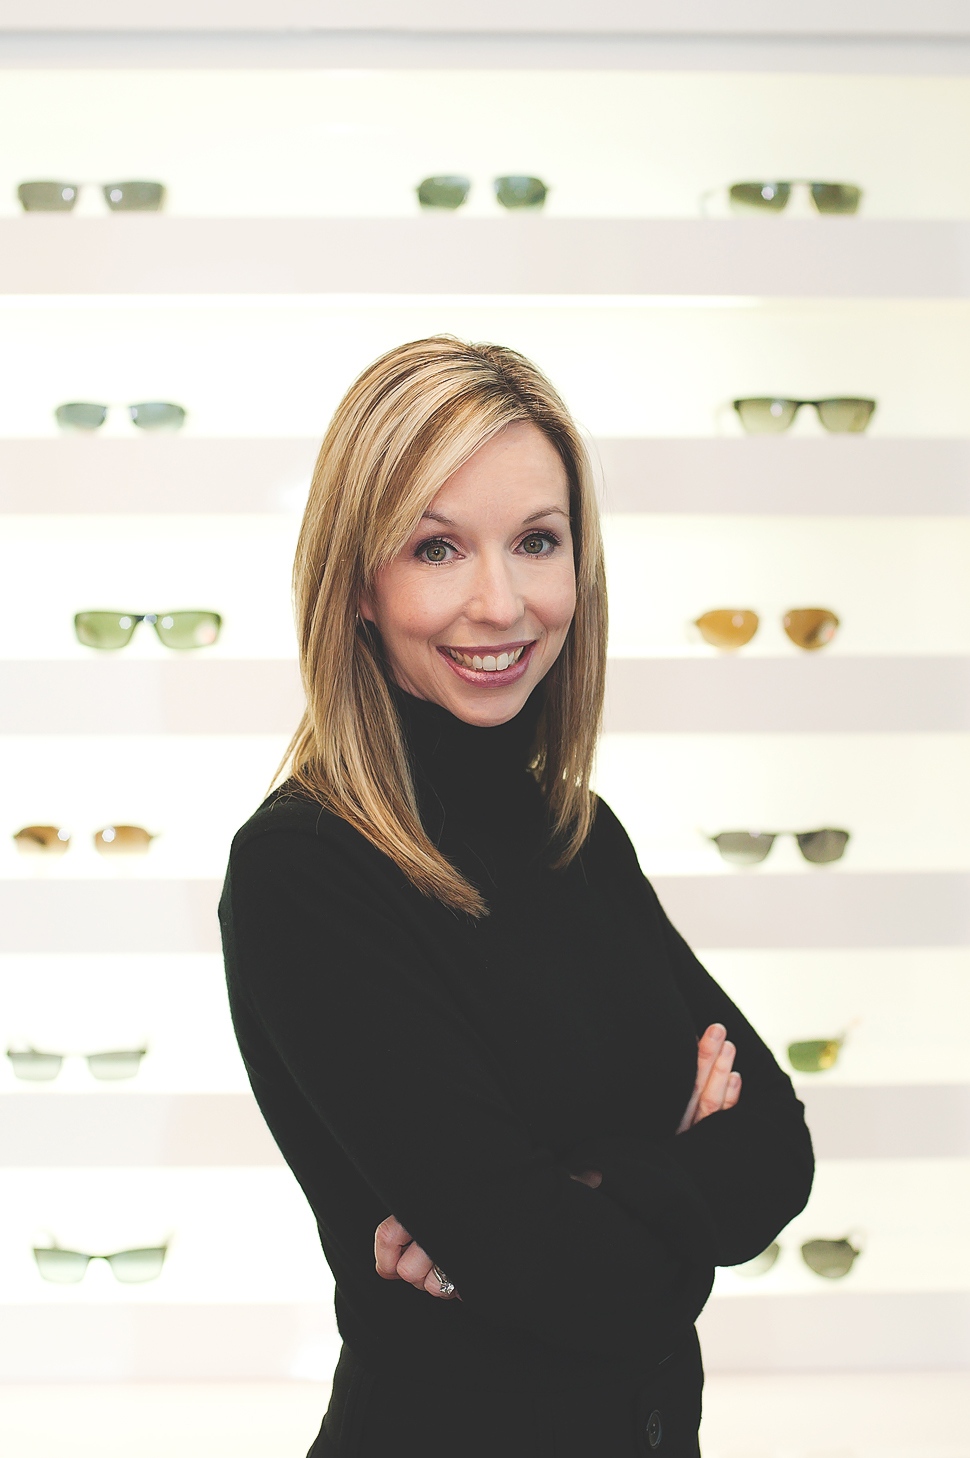 Dr. Erin Maruscak